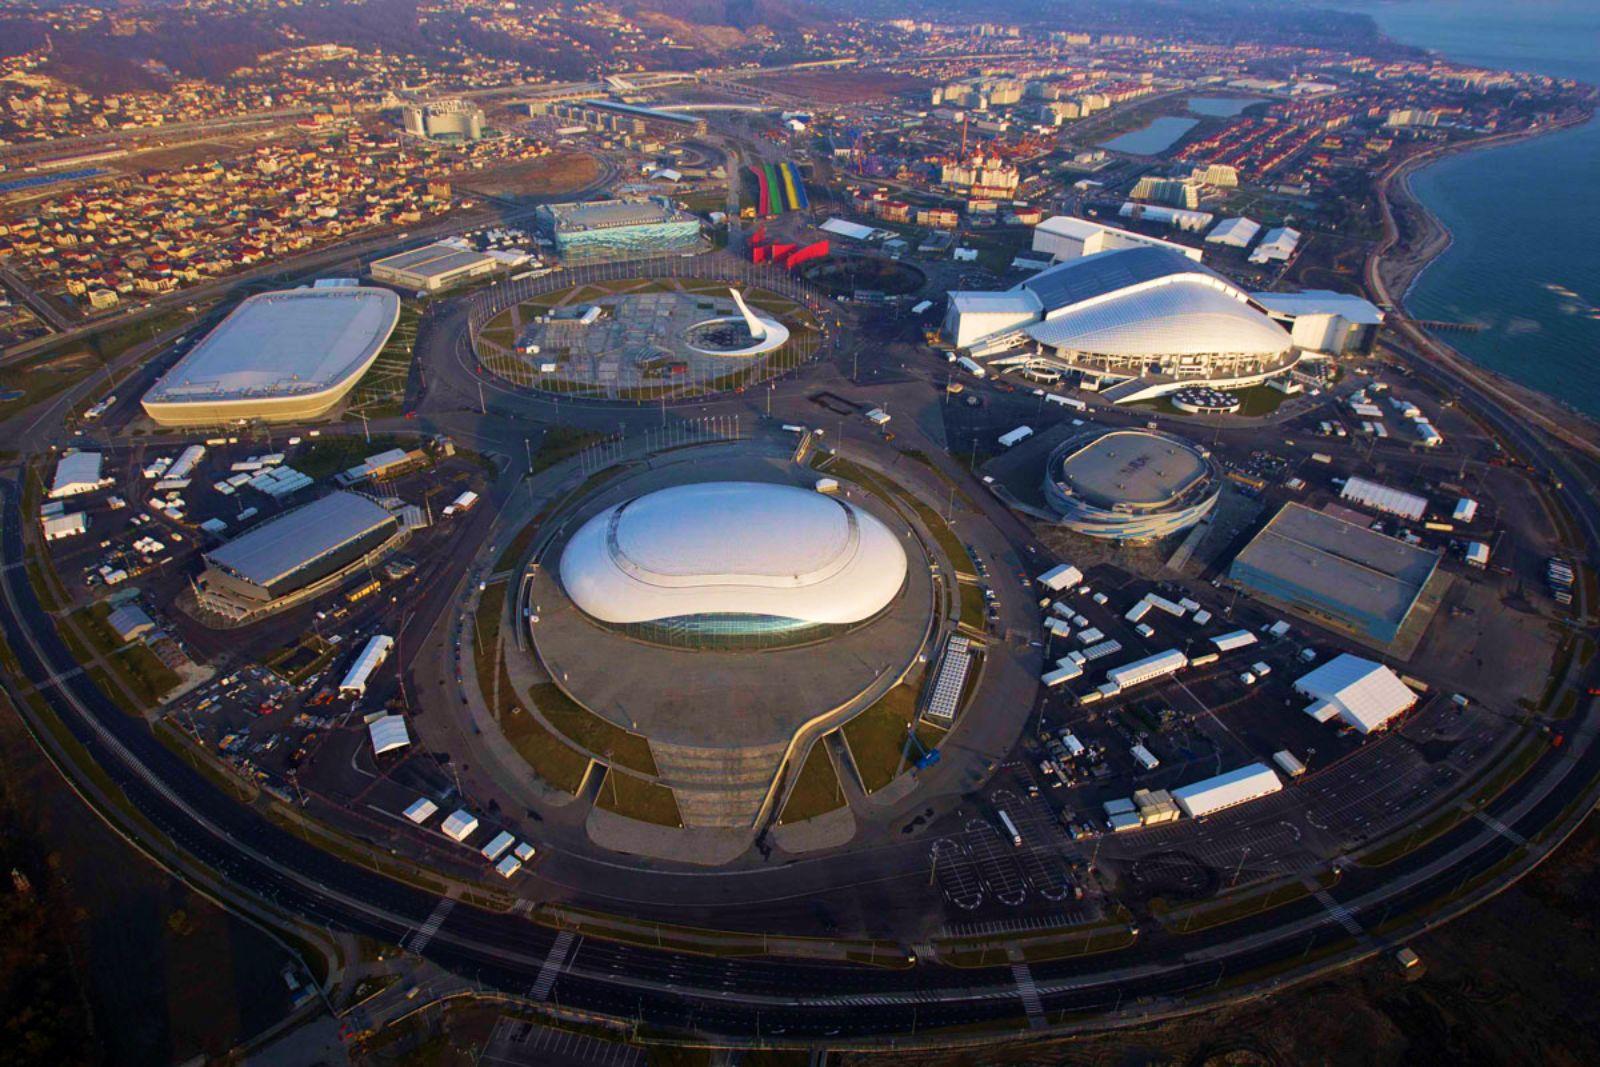 02-Sochi-2014-Olympics-Architecture